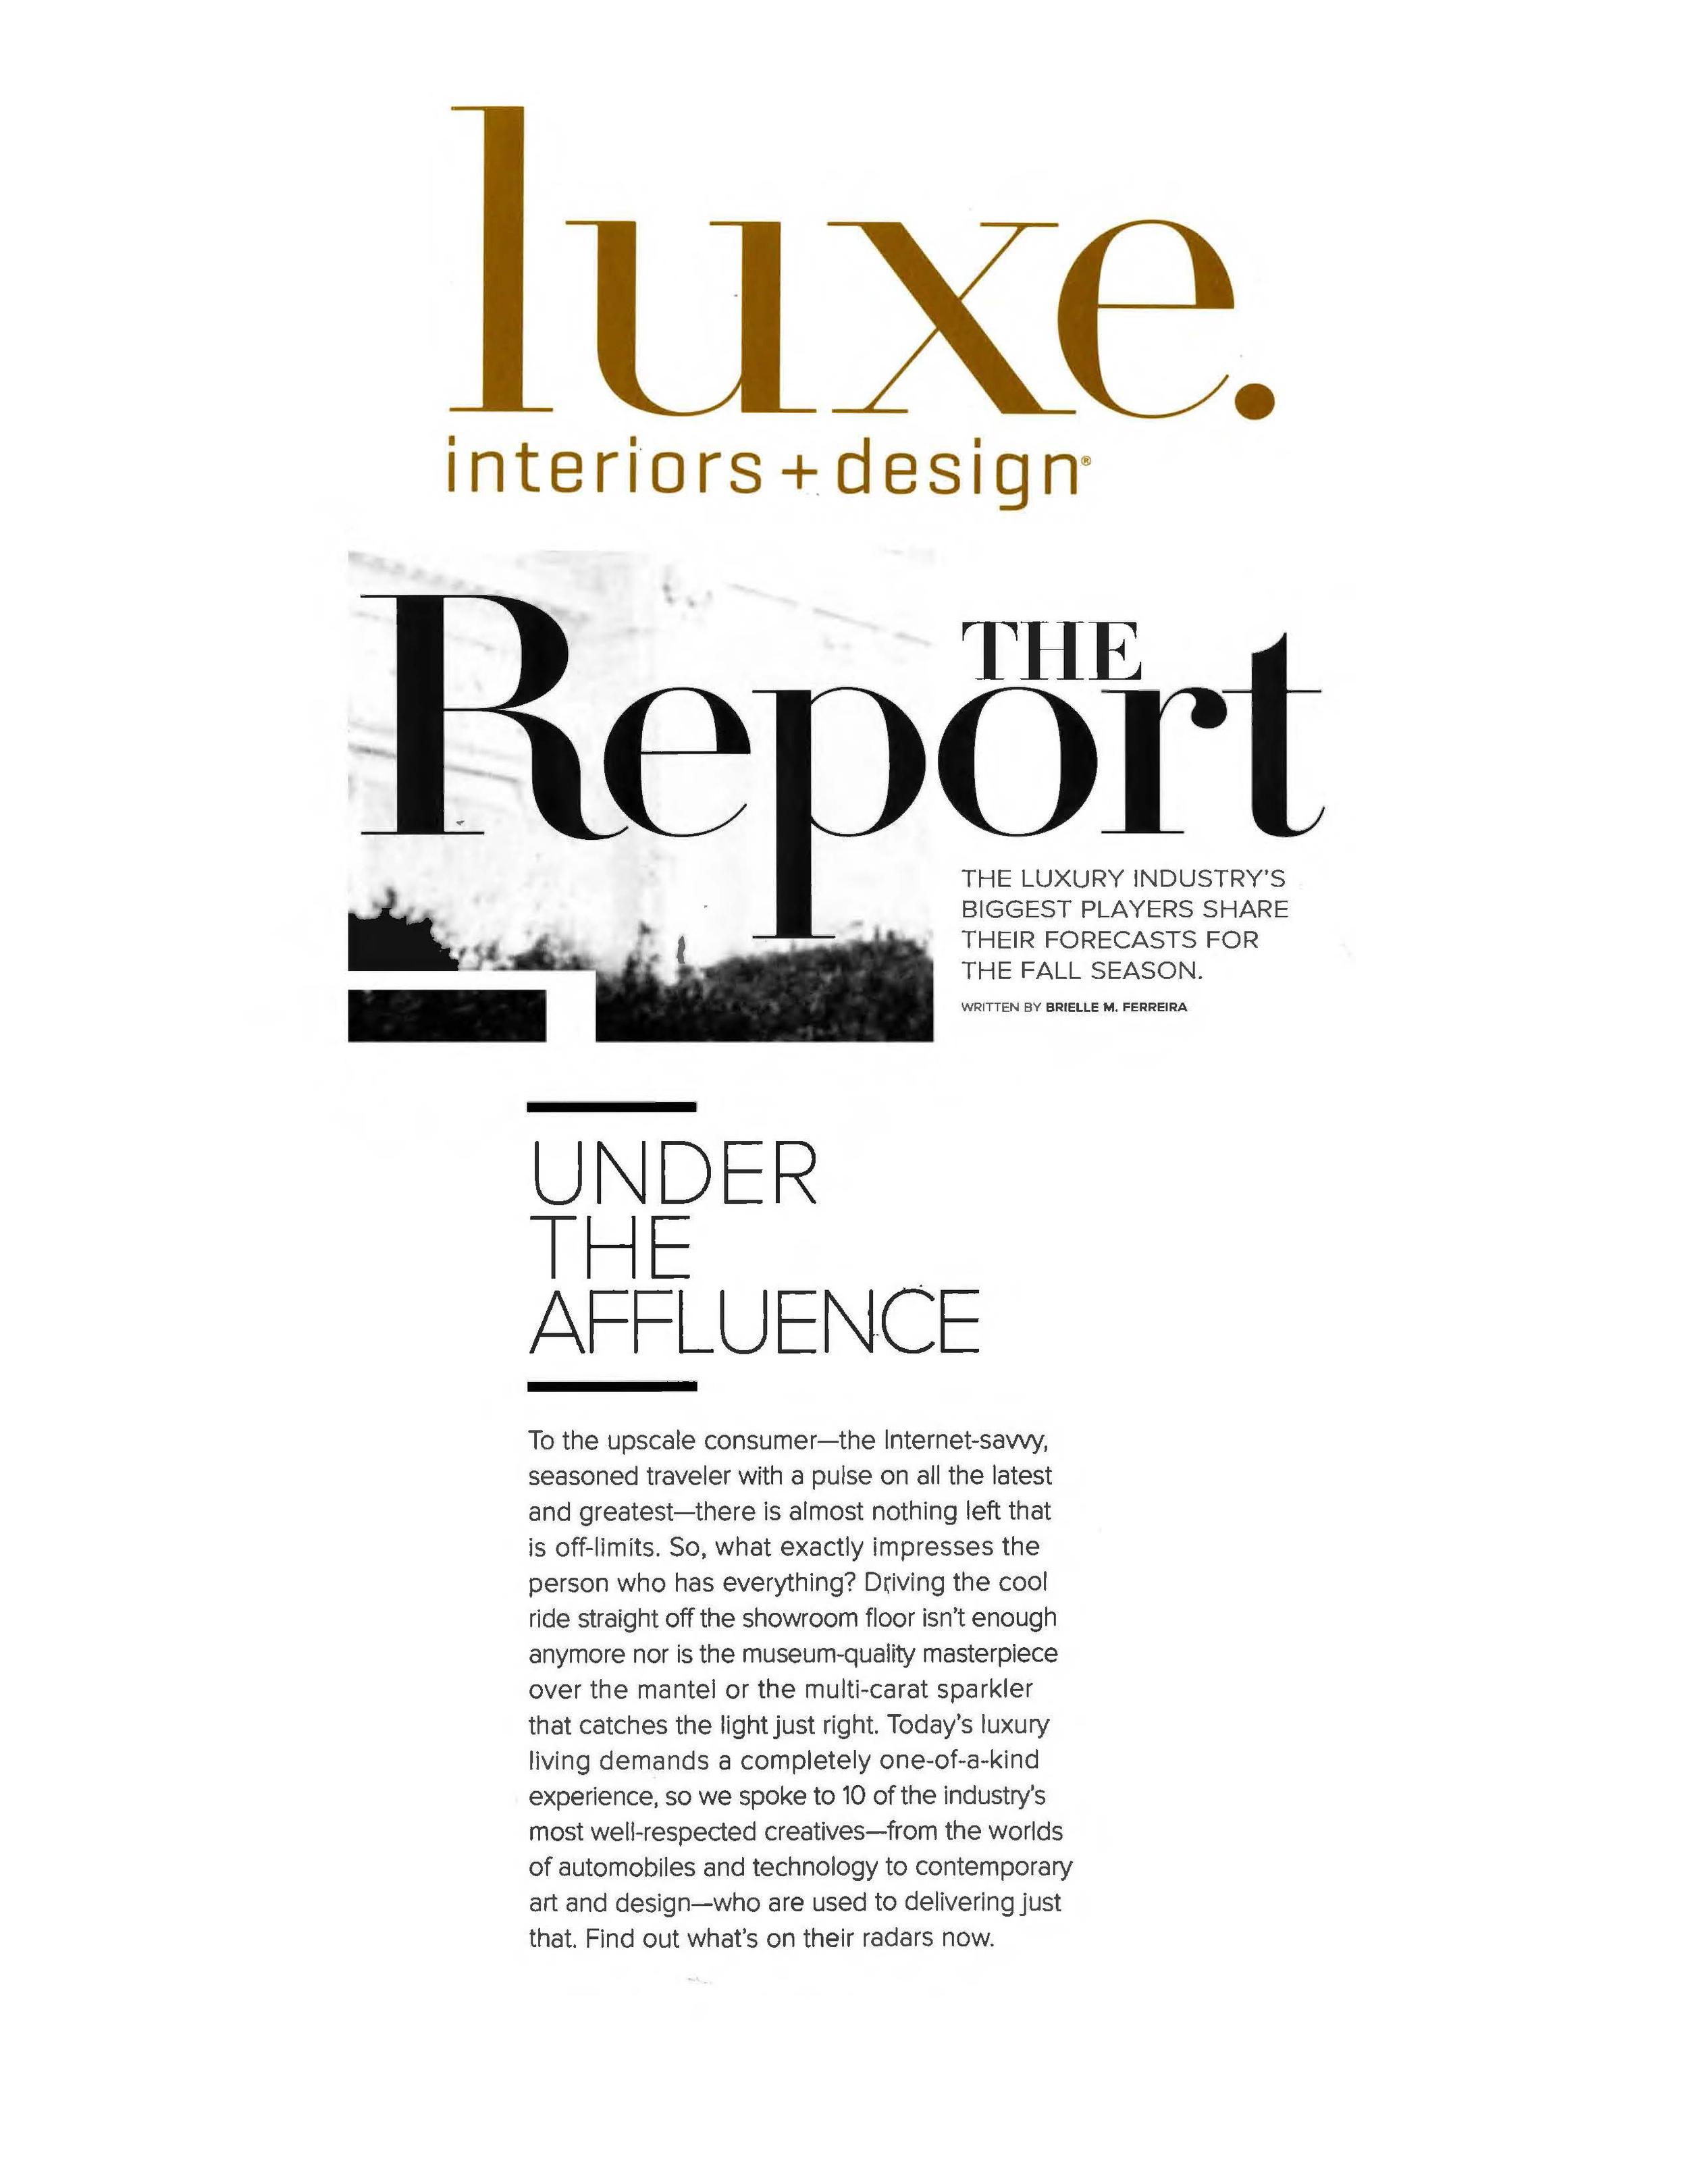 Luxe Interior+Design_Under the Affluence Sept- Oct-2015 - edit 4 (1).jpg